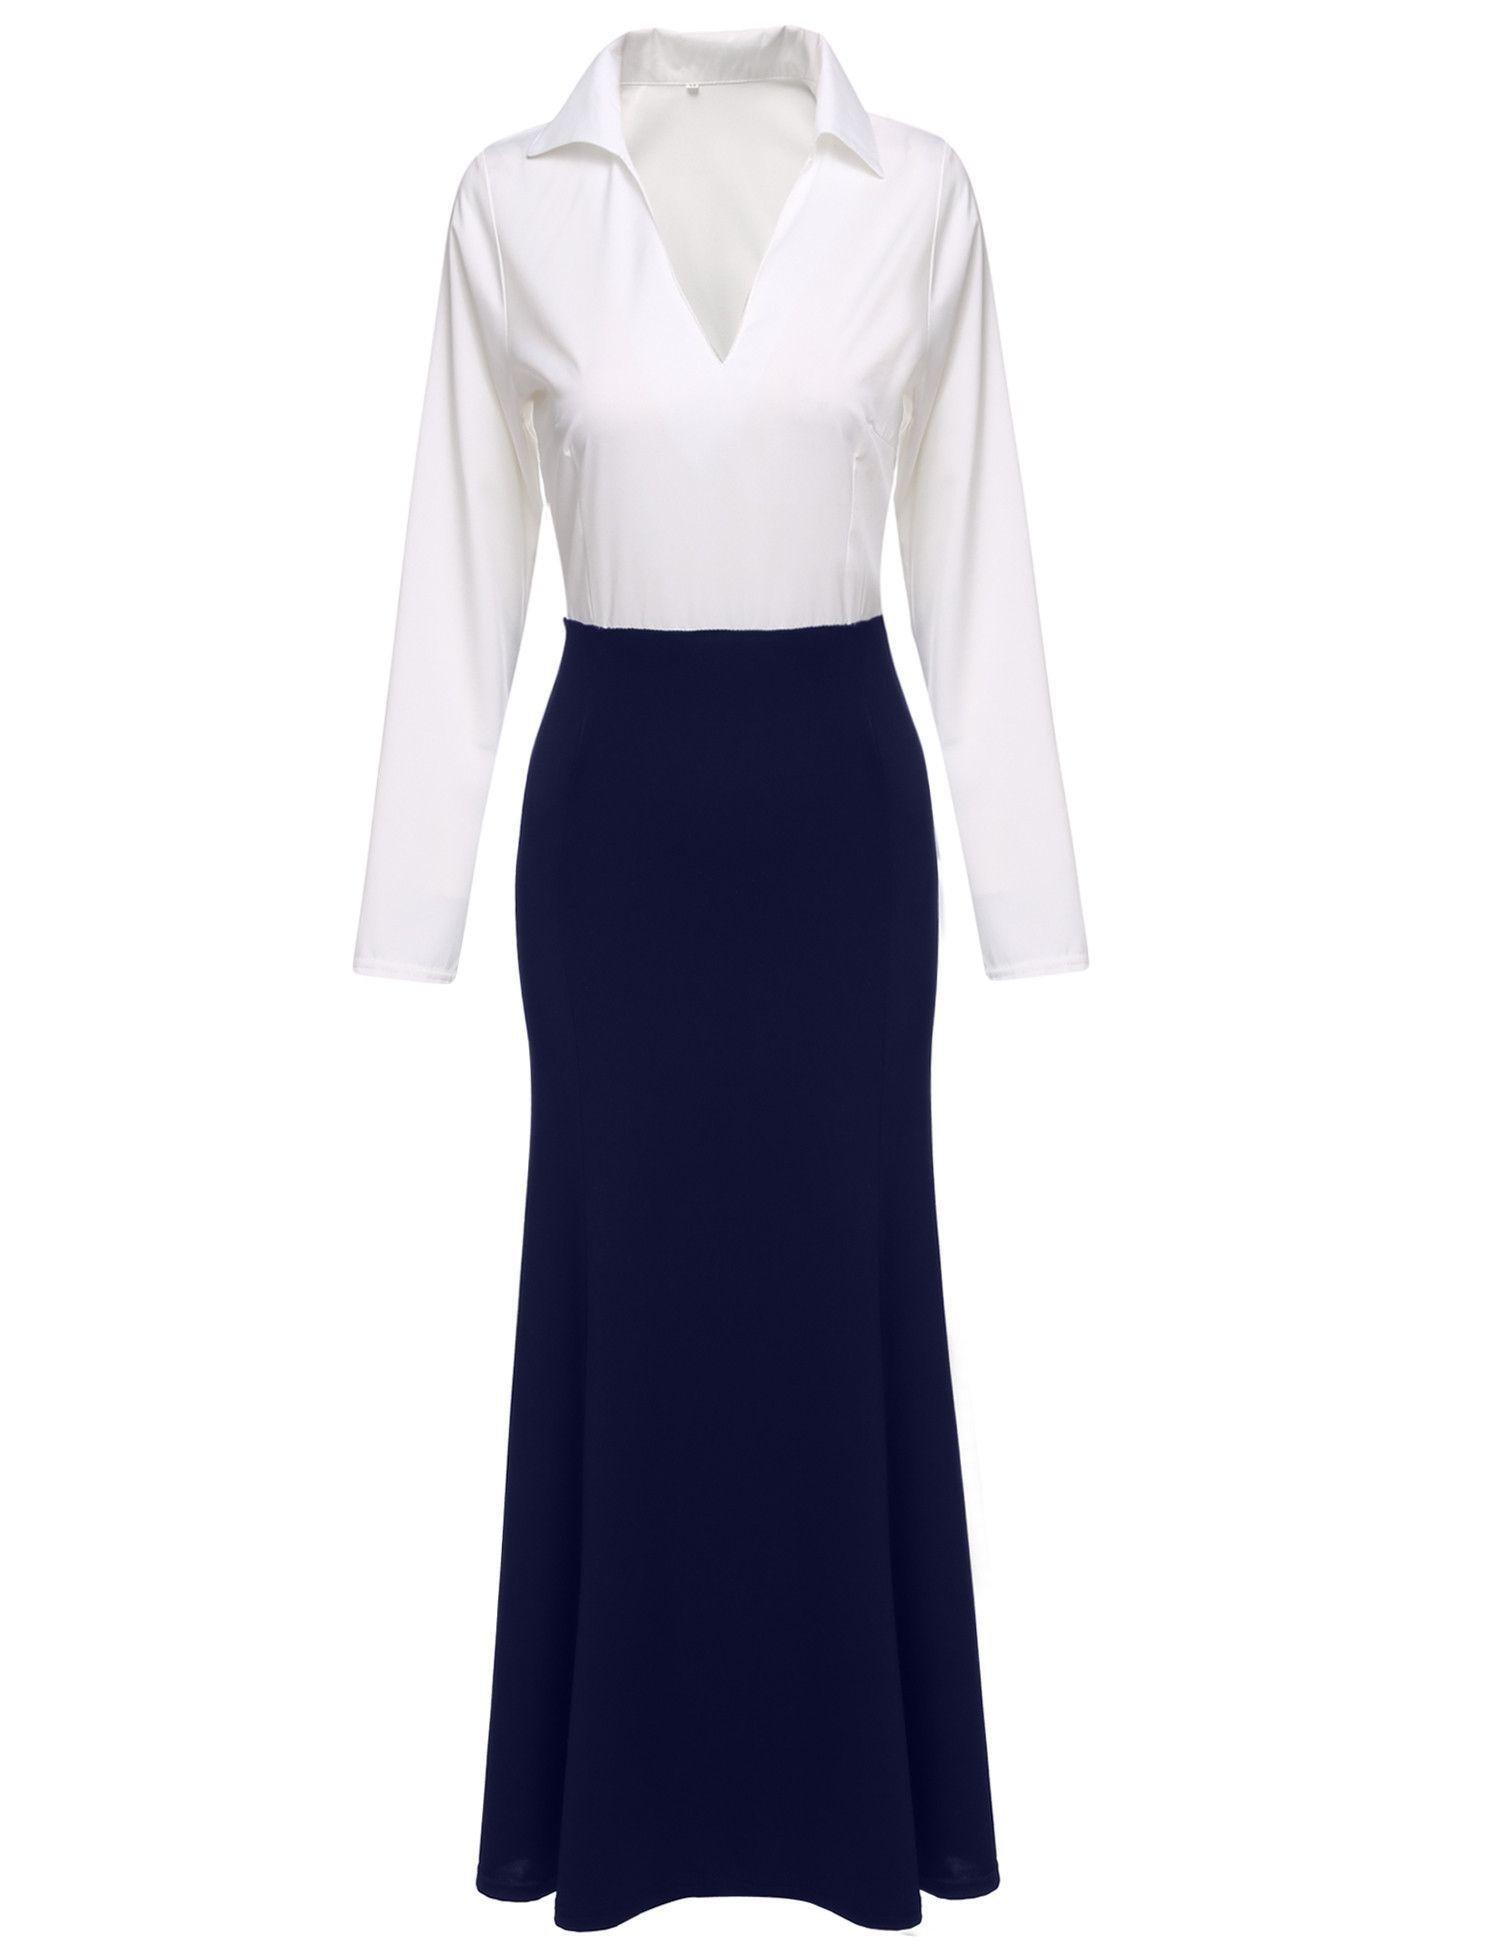 Fashion women vneck long sleeve patchwork slim fit maxi long dress